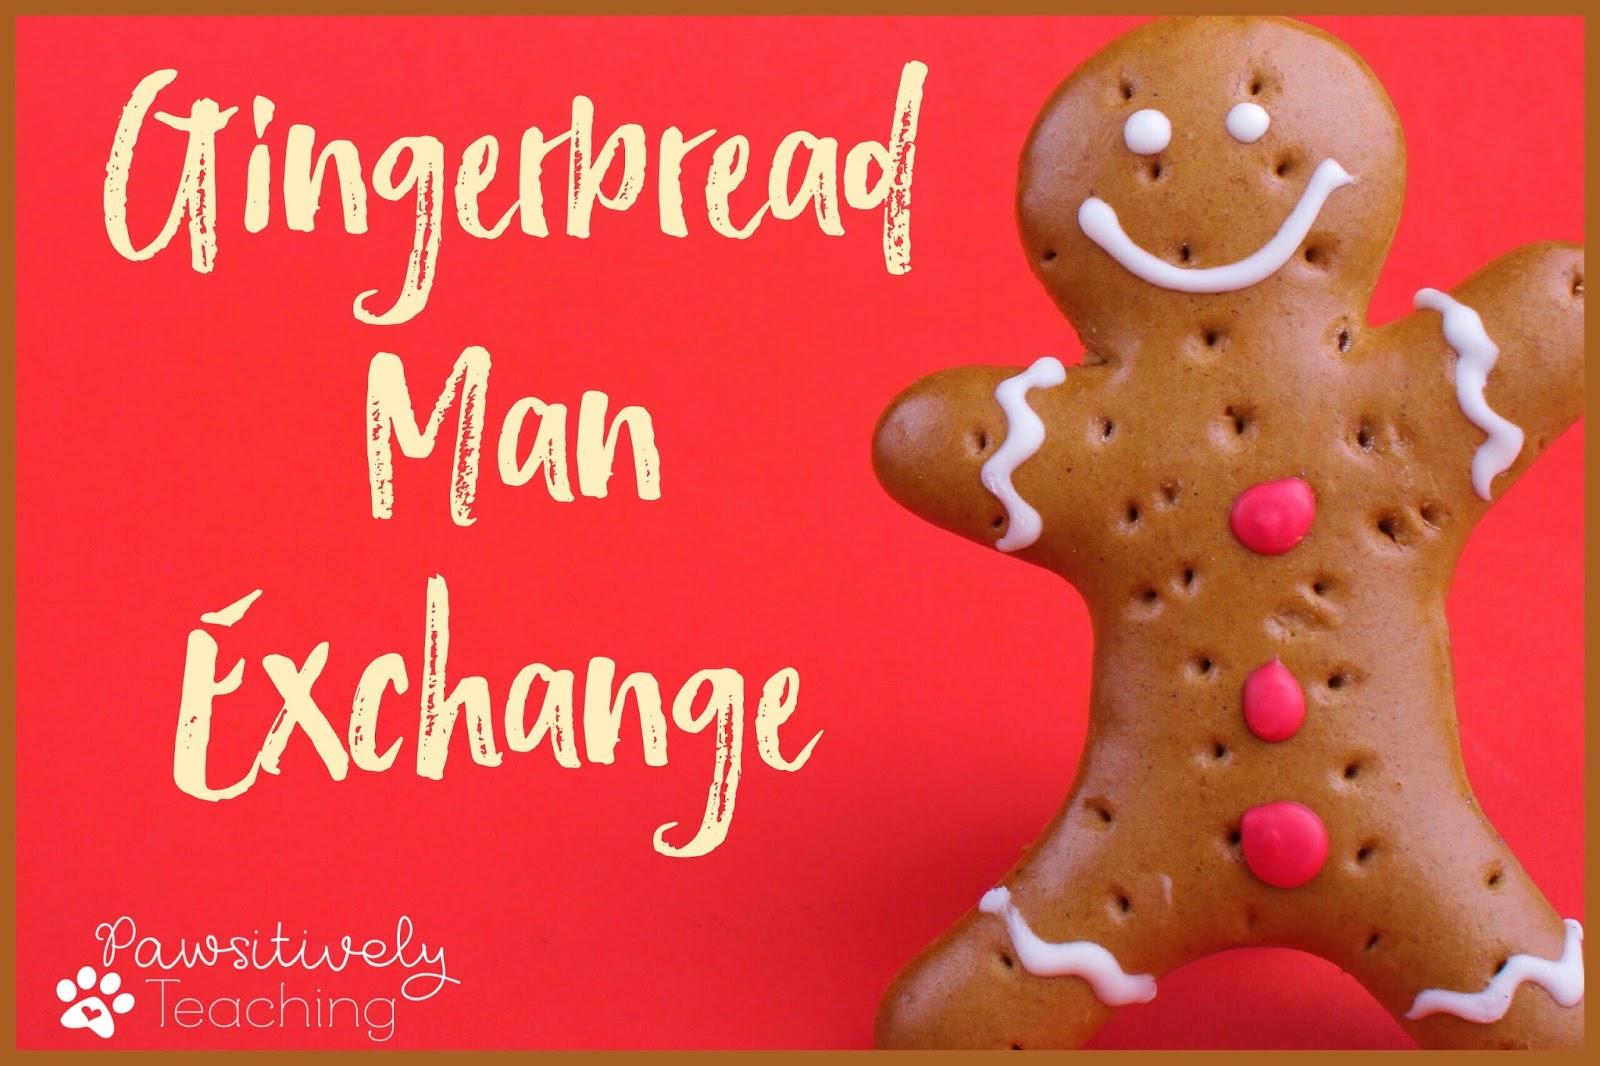 It's Back!  2016 Gingerbread Man Exchange